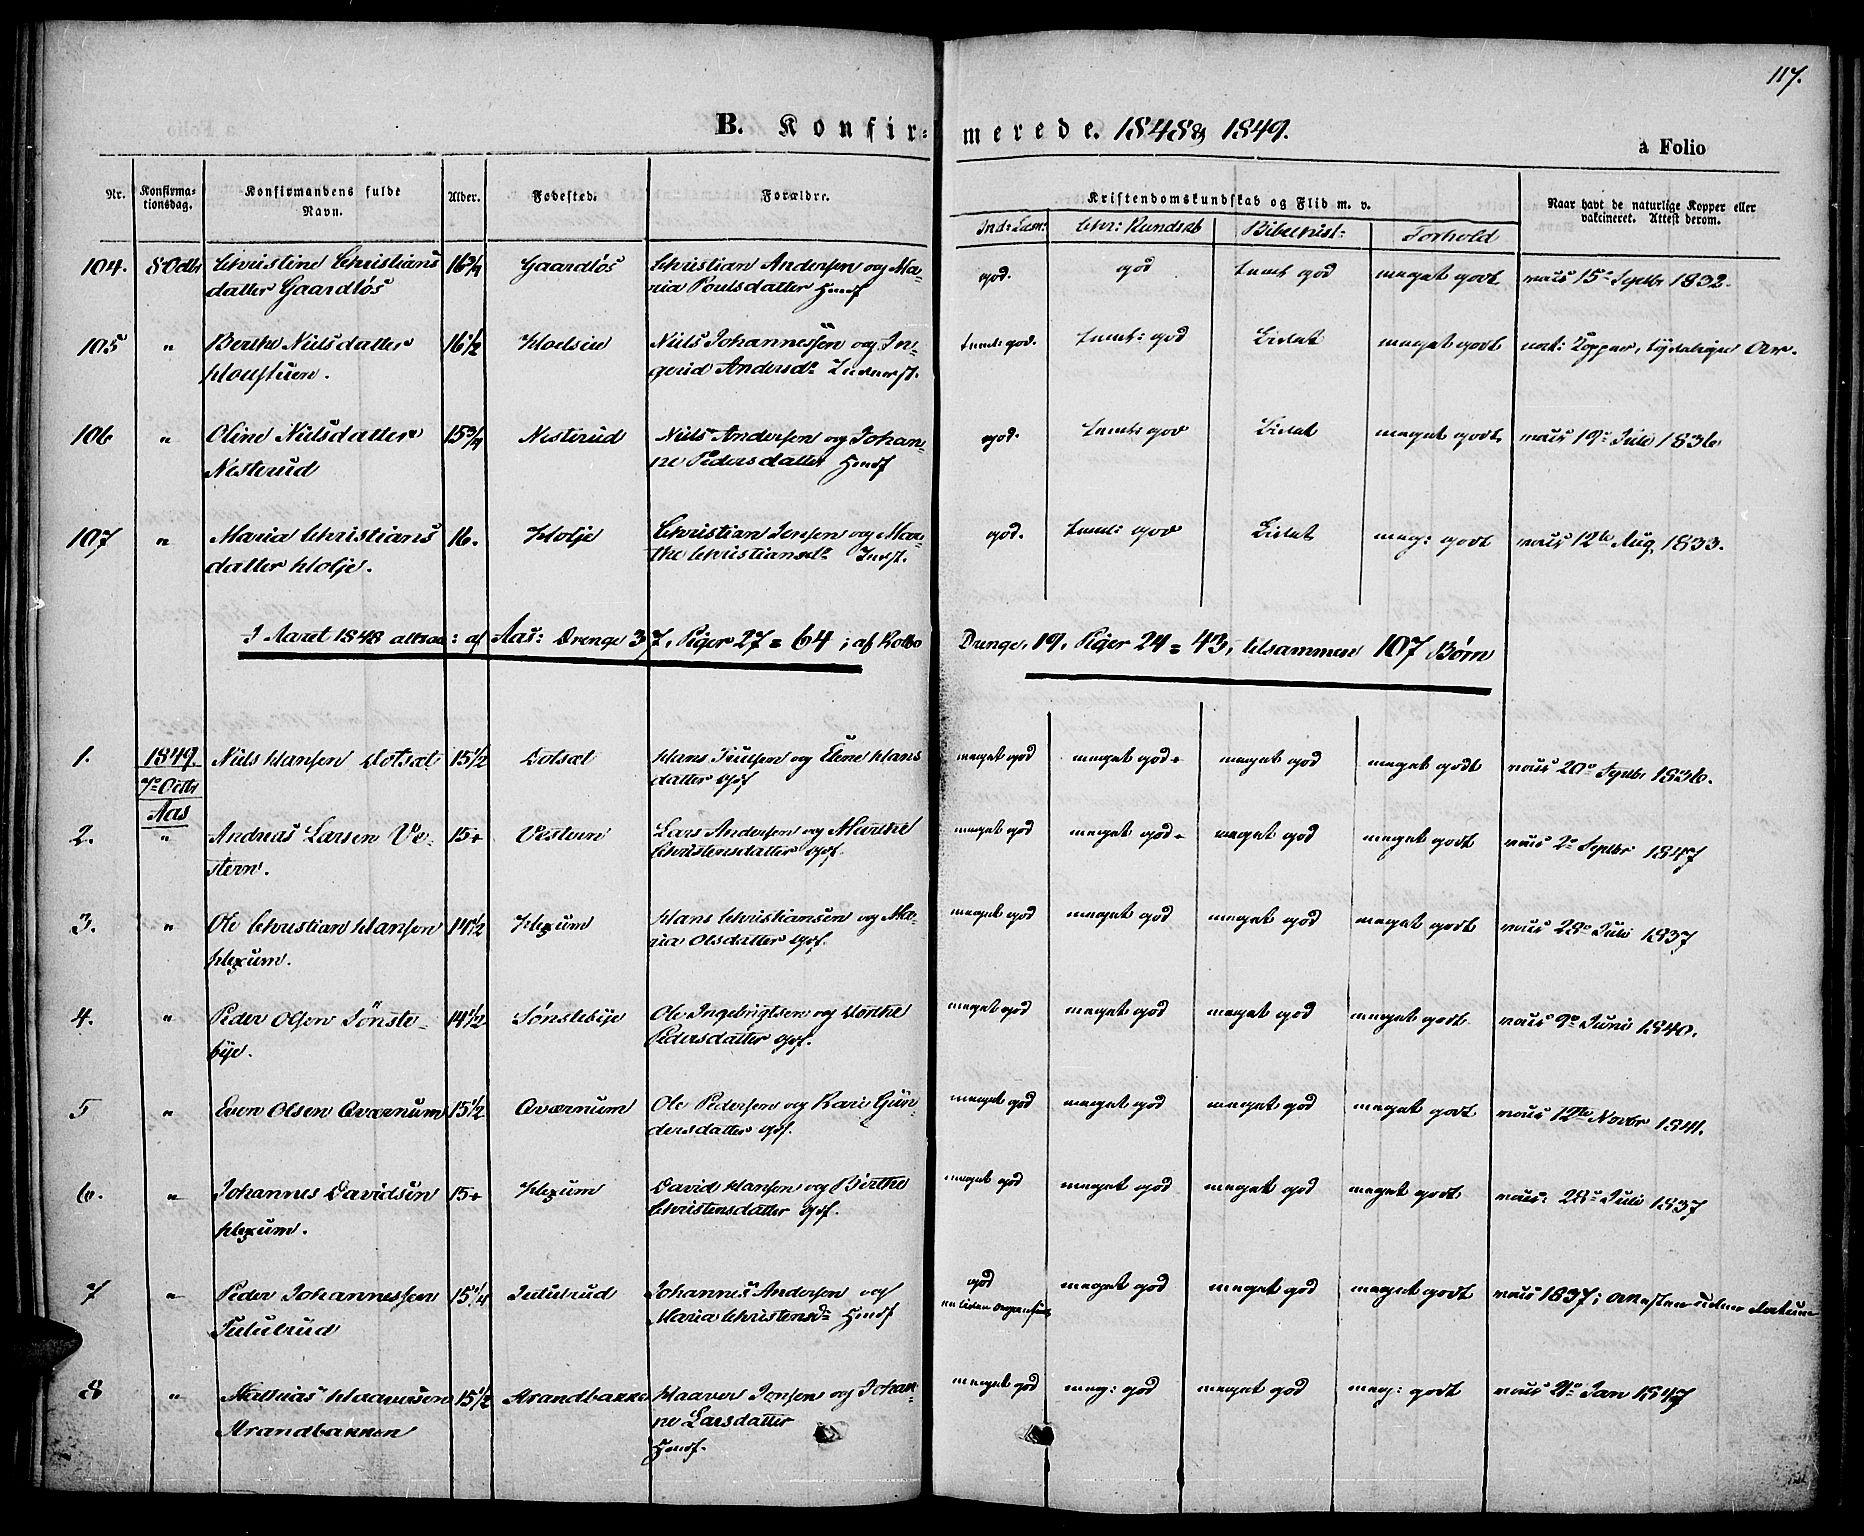 SAH, Vestre Toten prestekontor, H/Ha/Haa/L0004: Ministerialbok nr. 4, 1844-1849, s. 117